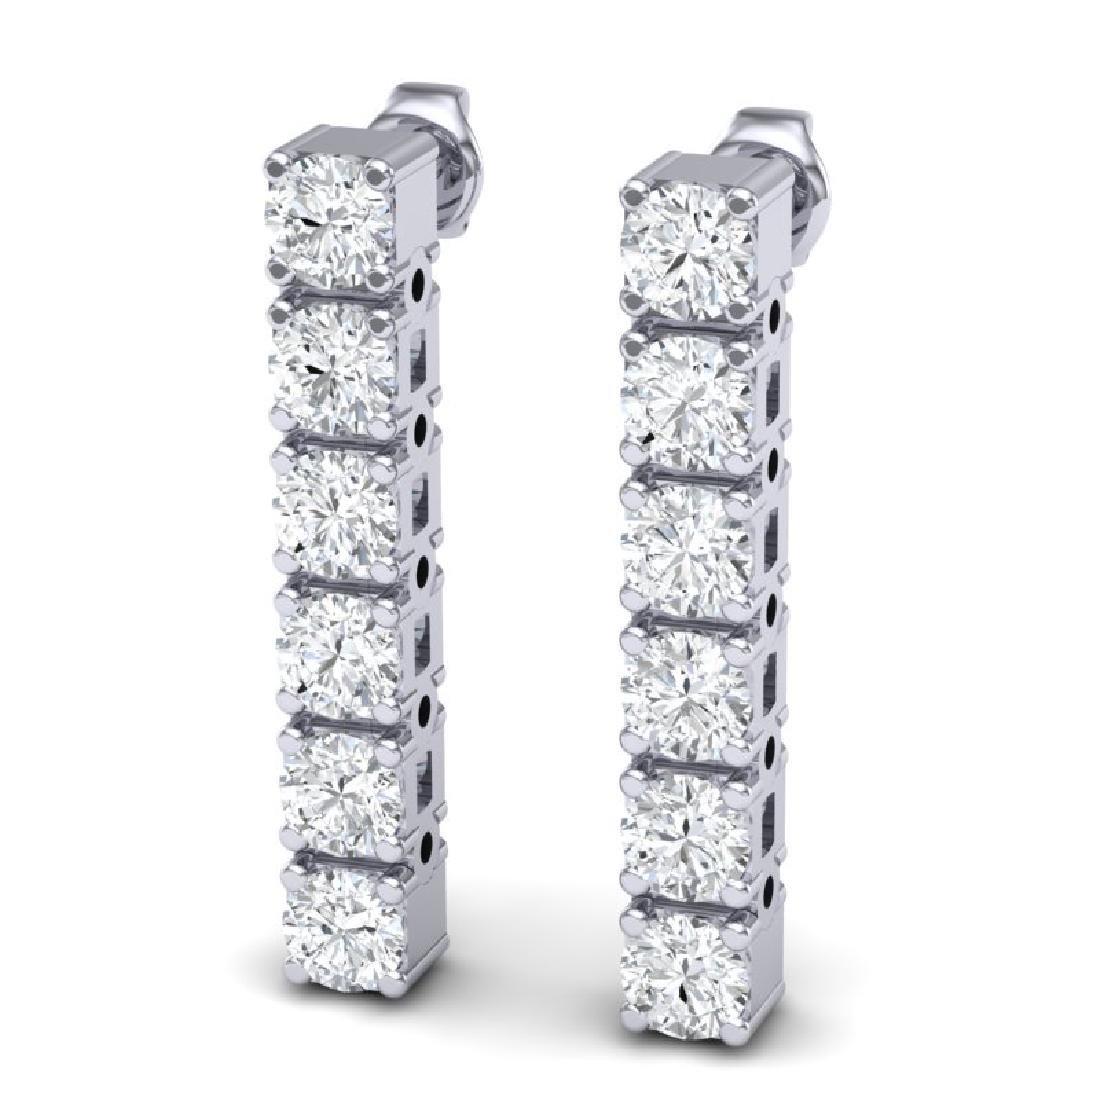 3 CTW Certified VS/SI Diamond Earrings 18K White Gold - 2